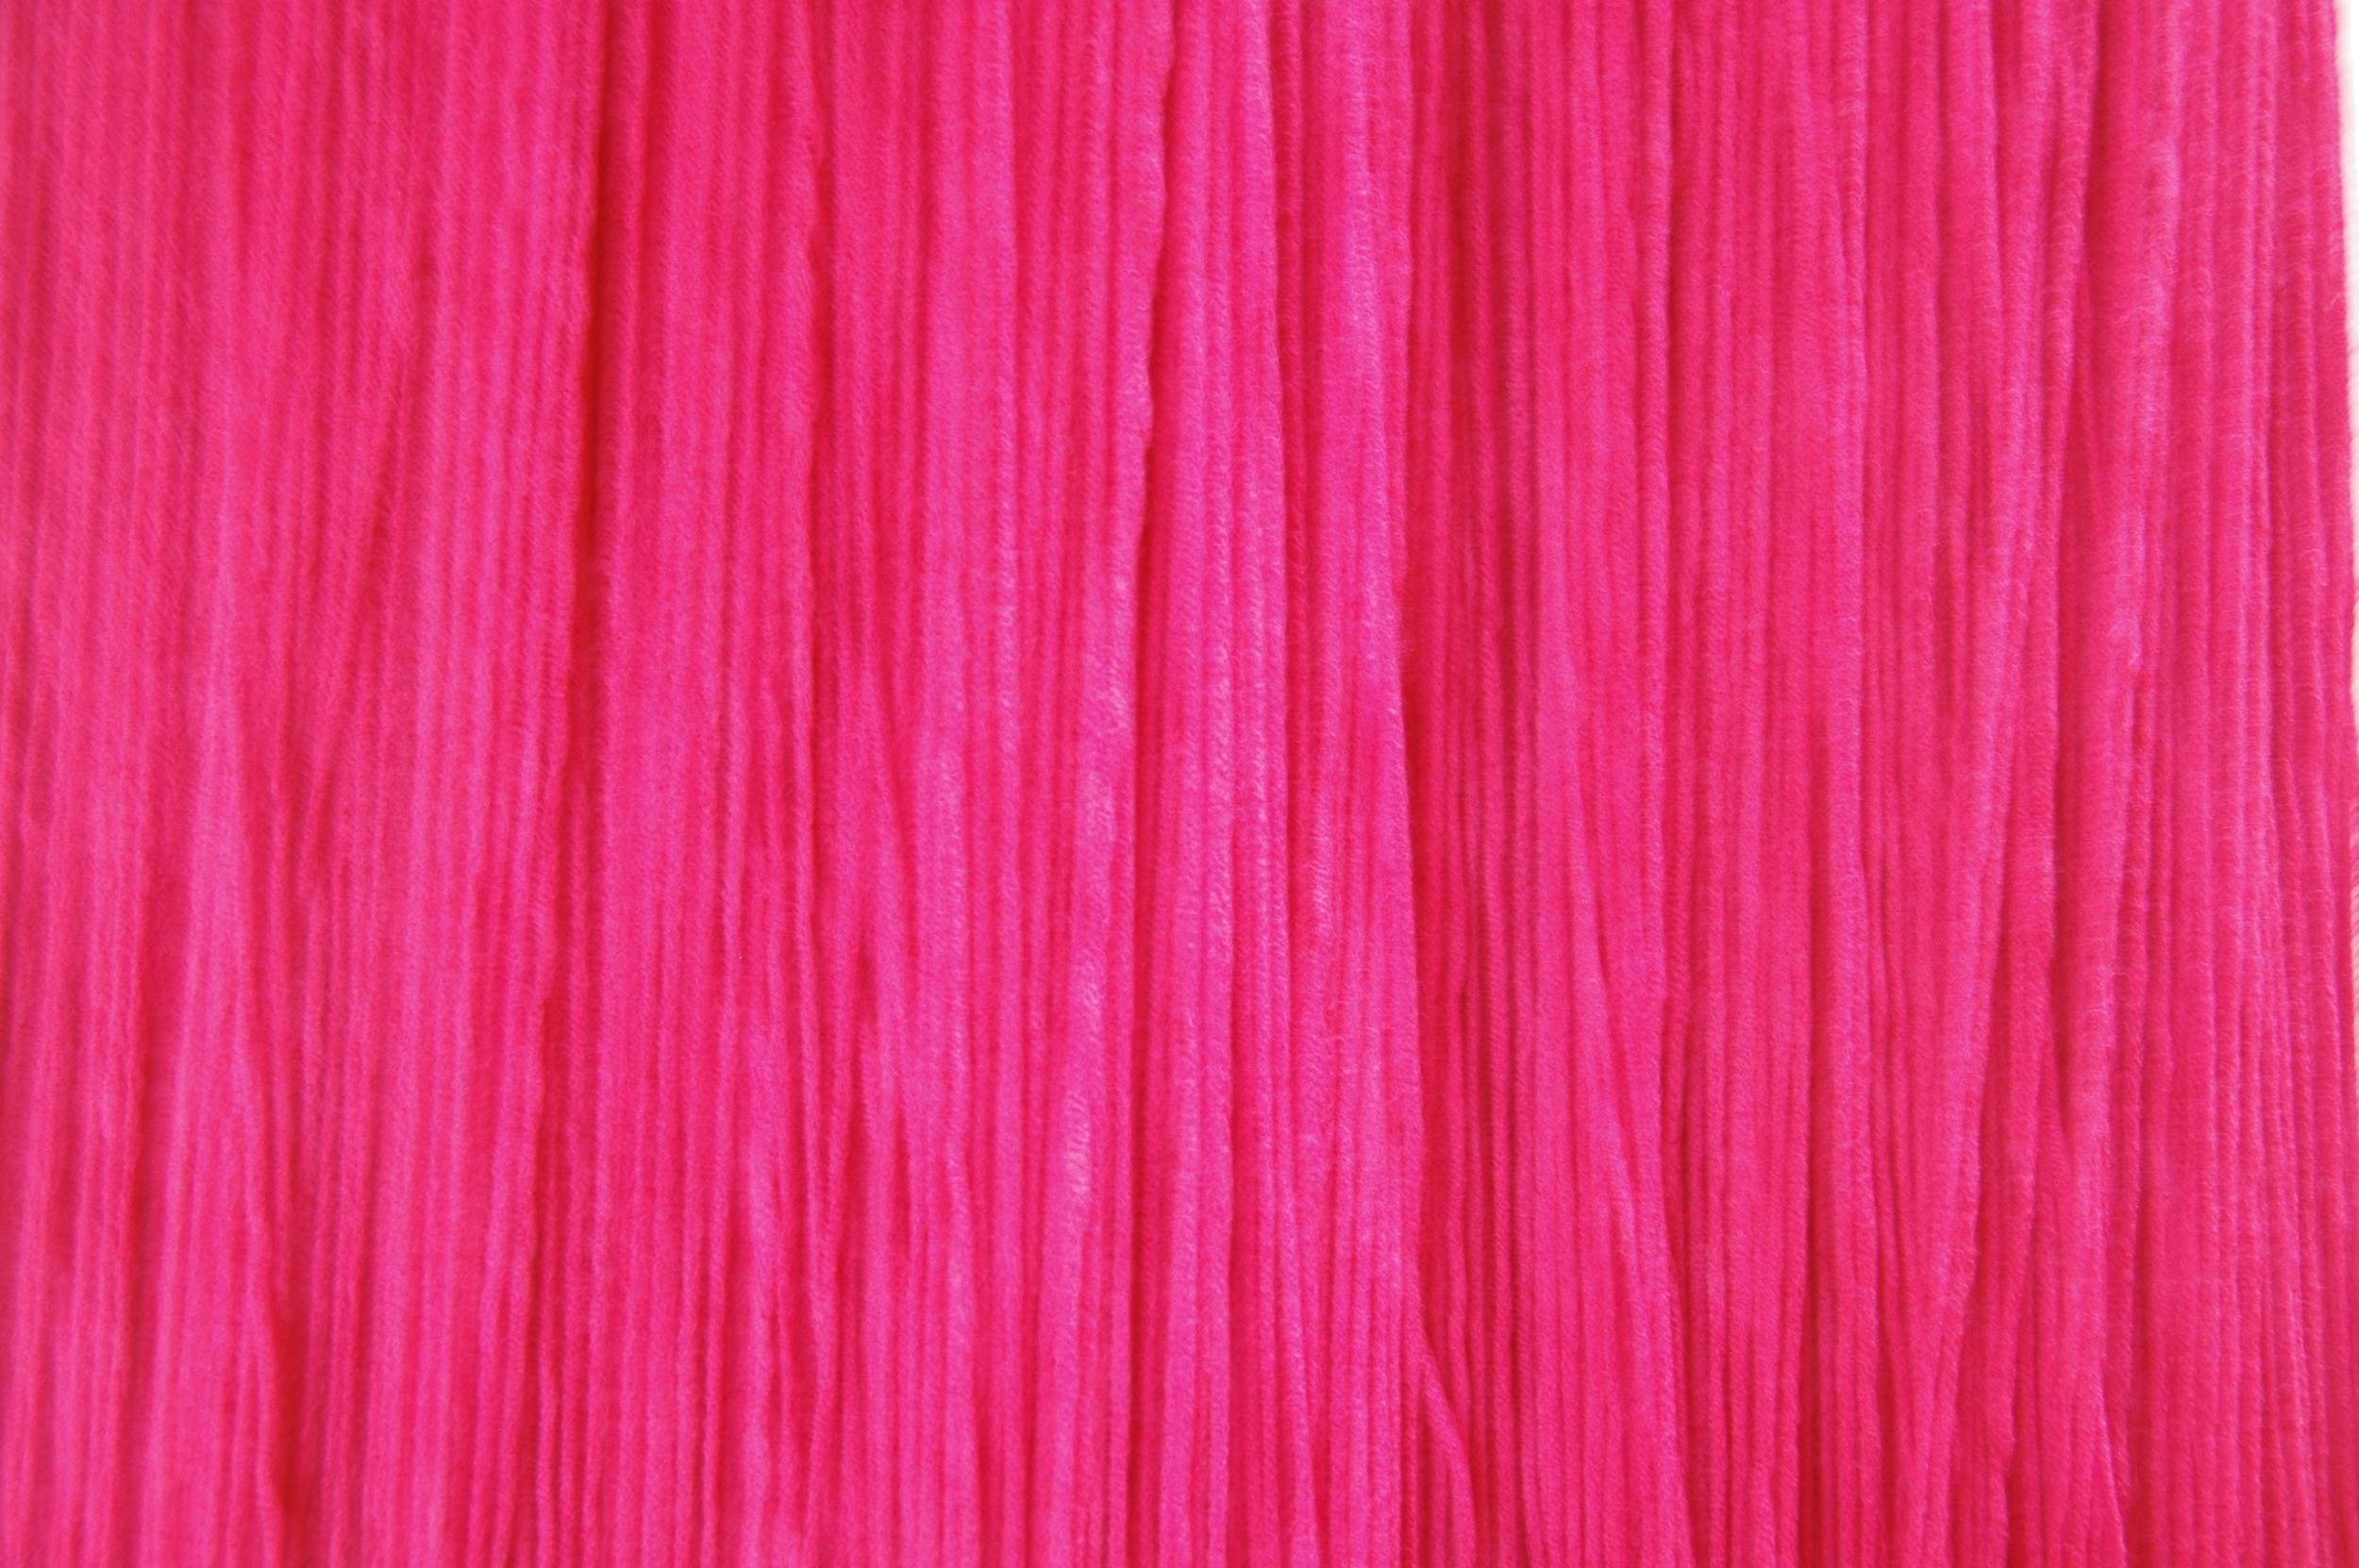 A Work in Progress: TRIM (Installation at Usdan Gallery, Bennington College), 2010, Acrylic yarn, 14' x 40' x 80' (Detail)